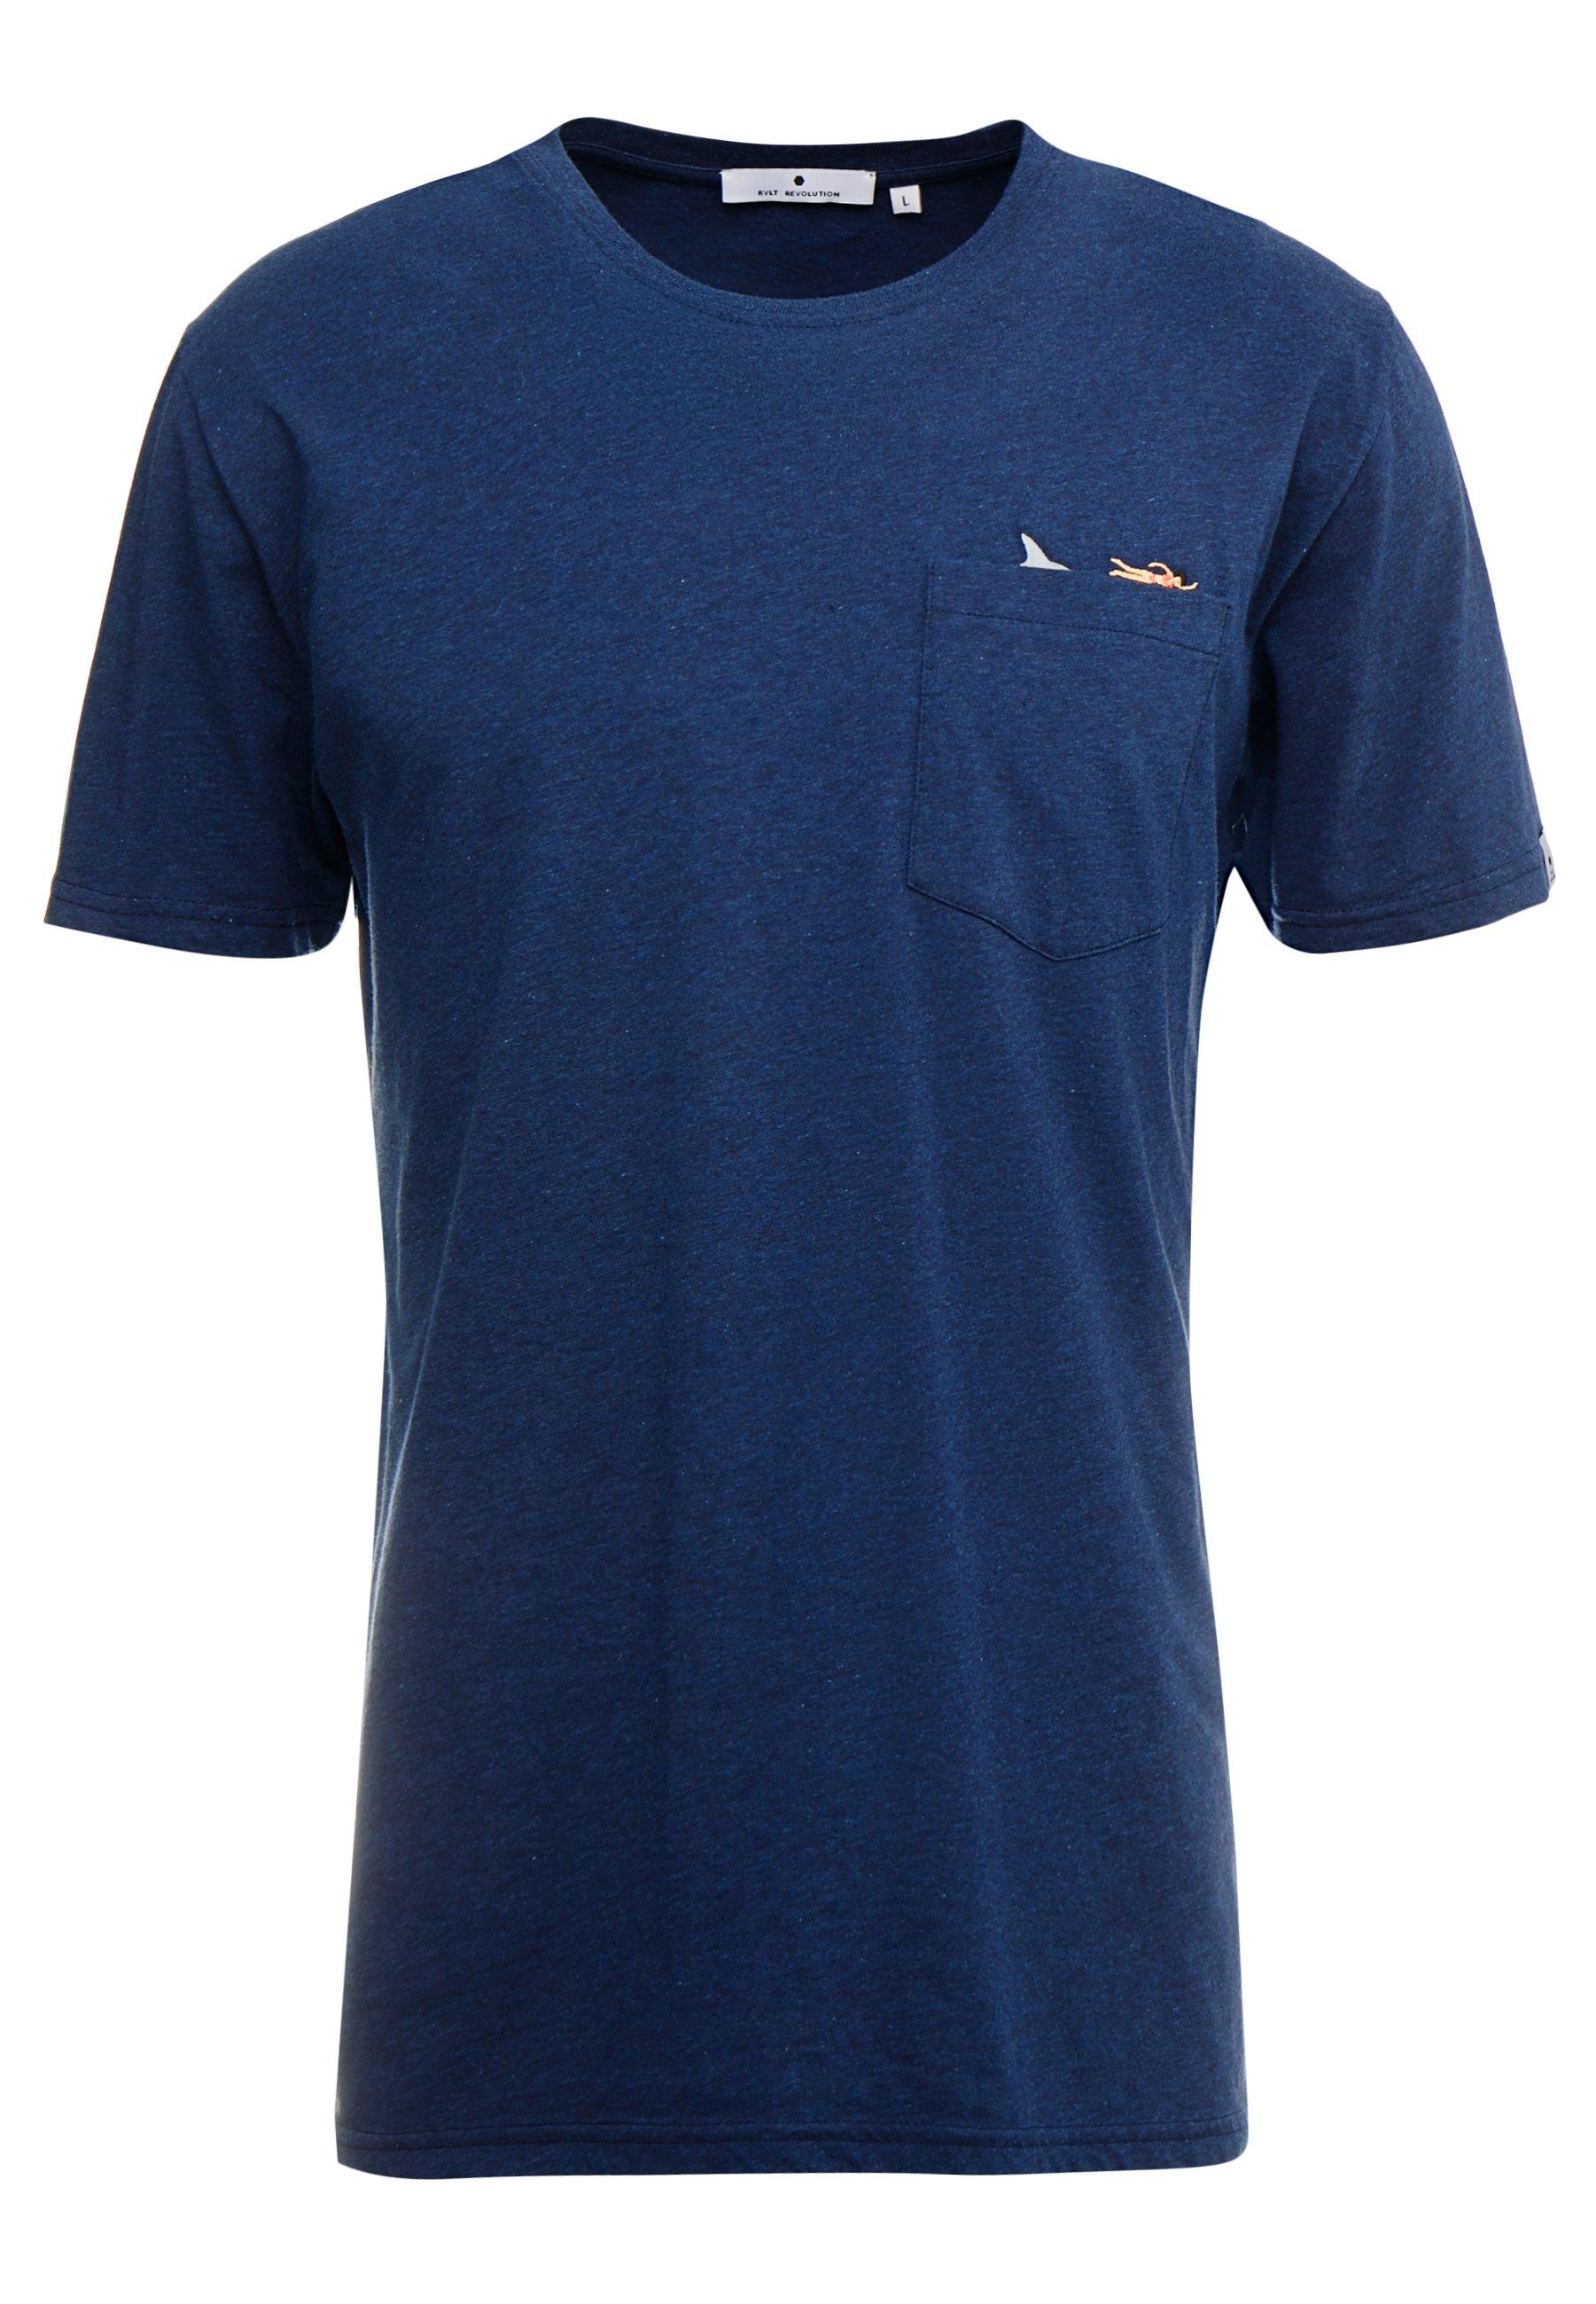 Rvlt T-shirt Imprimé - Navy Melange